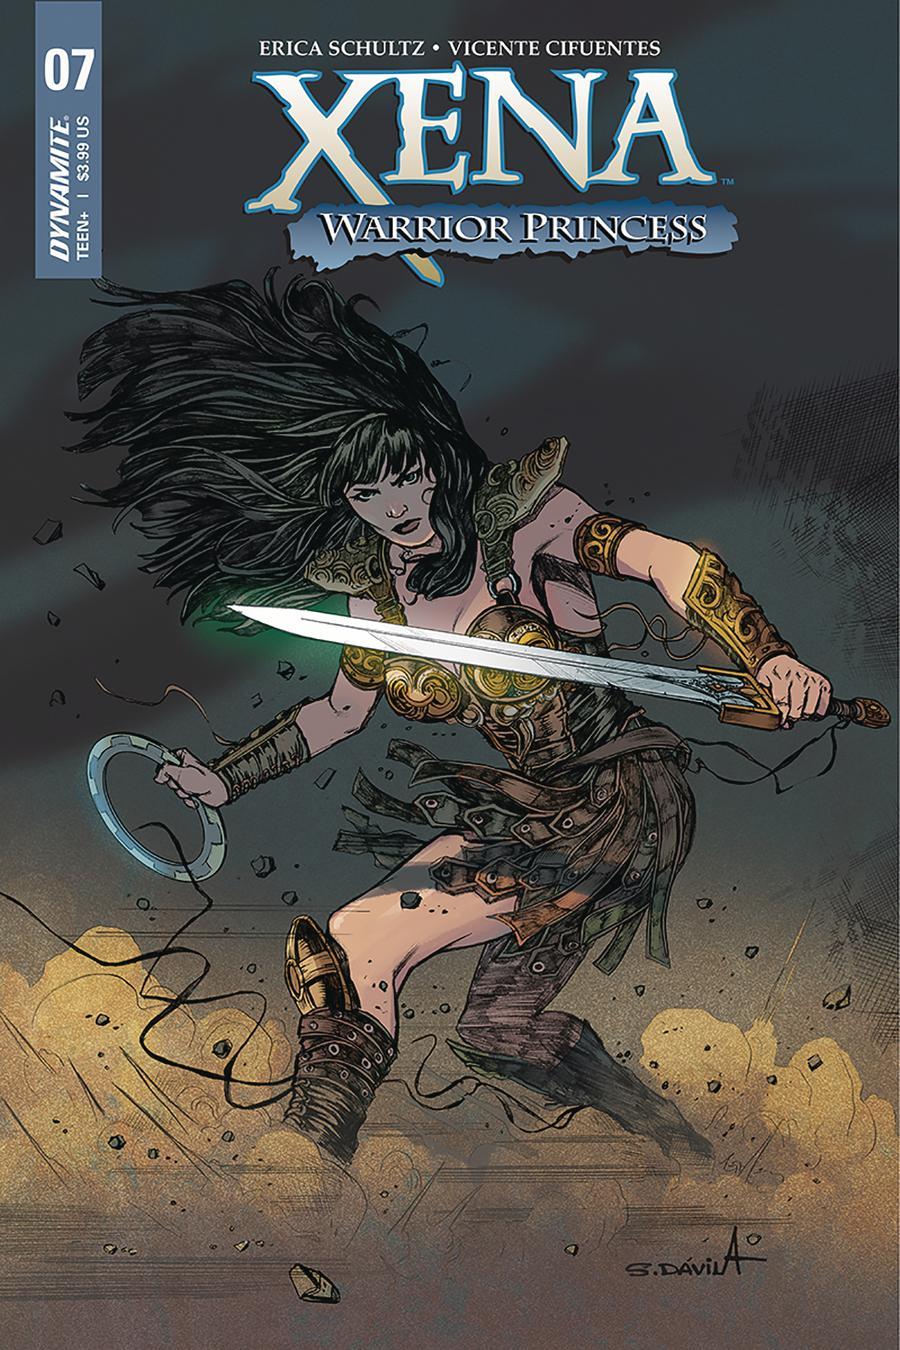 Xena Vol 2 #7 Cover A Regular Sergio Davila Cover